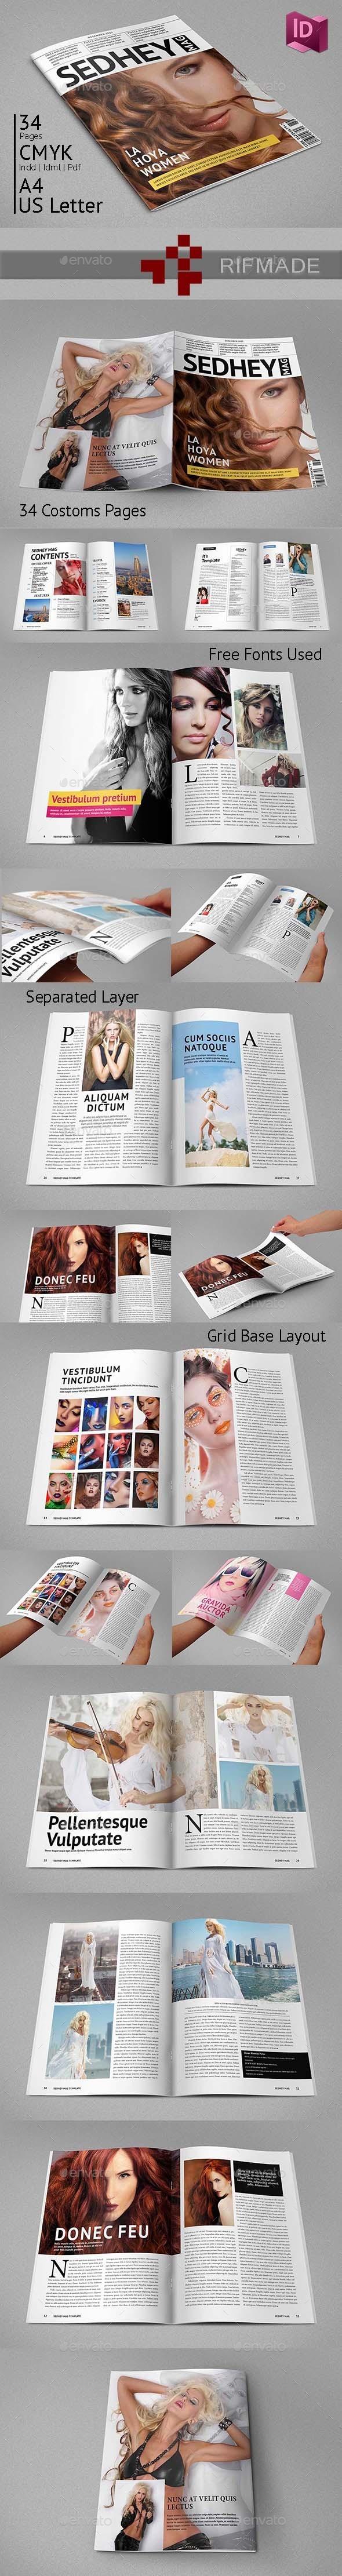 GraphicRiver Indesign Magazine Template 9557652